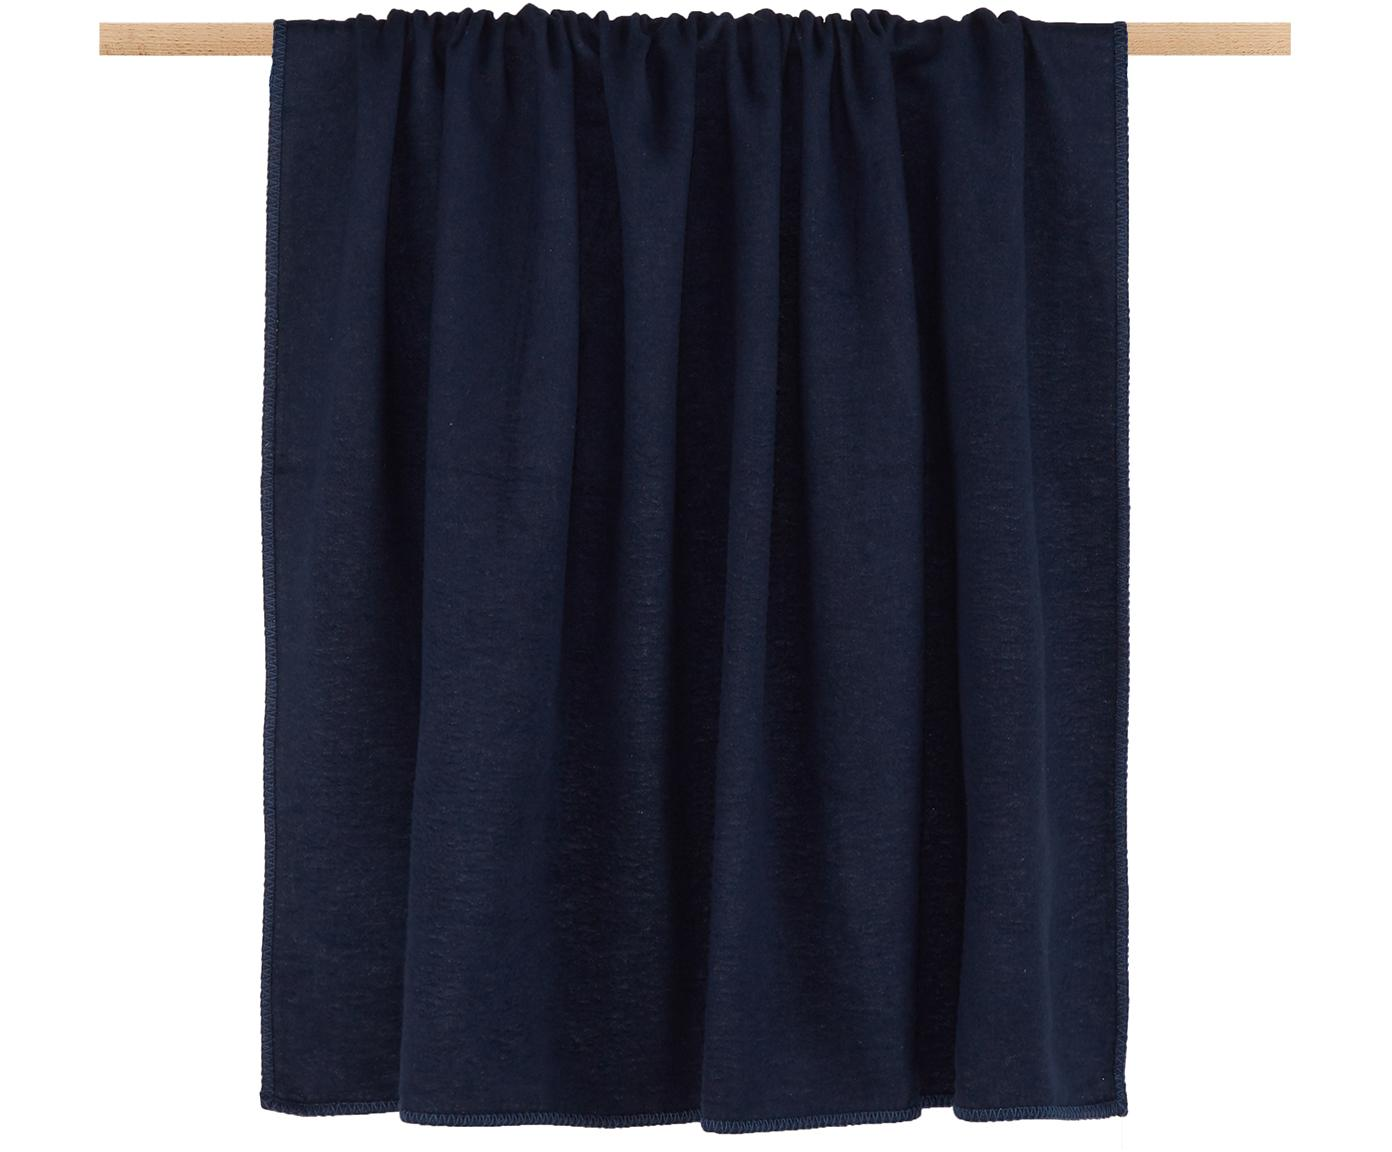 Fleece-Plaid Sylt in Marineblau mit Steppnaht, Webart: Jacquard, Marineblau, 140 x 200 cm